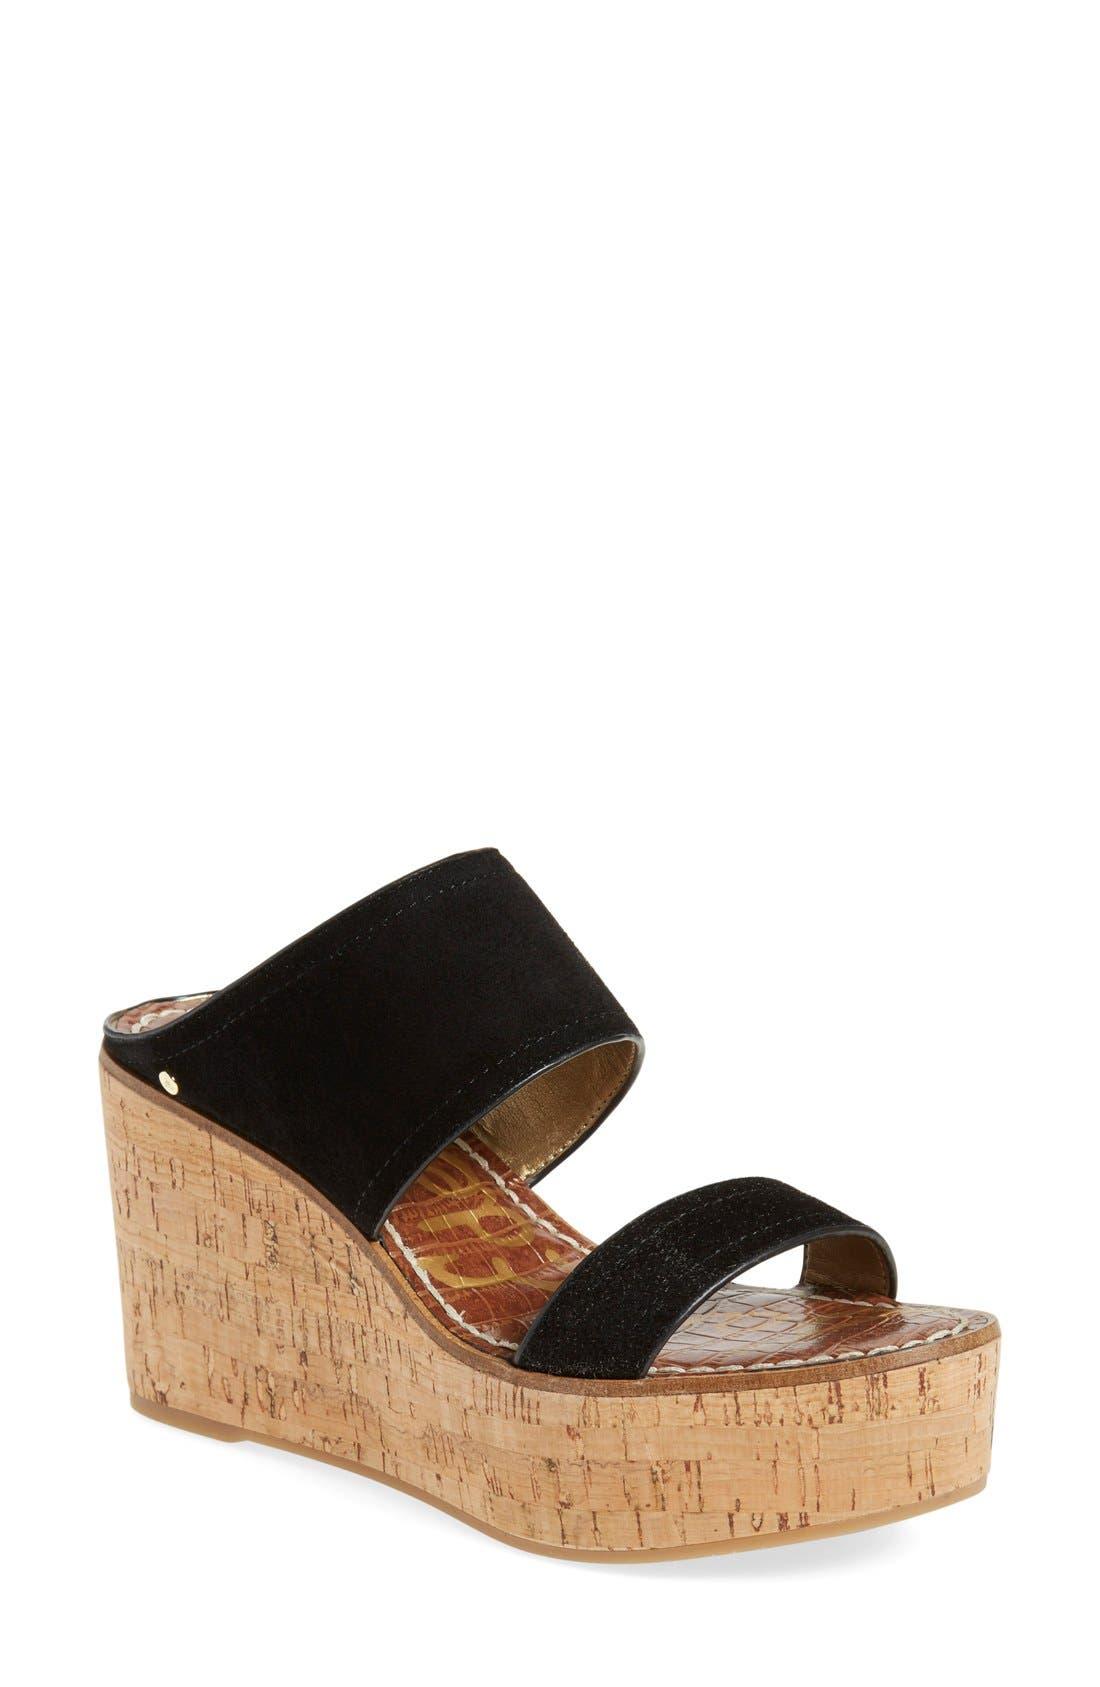 'Dali' Wedge Sandal,                             Main thumbnail 1, color,                             Black Suede